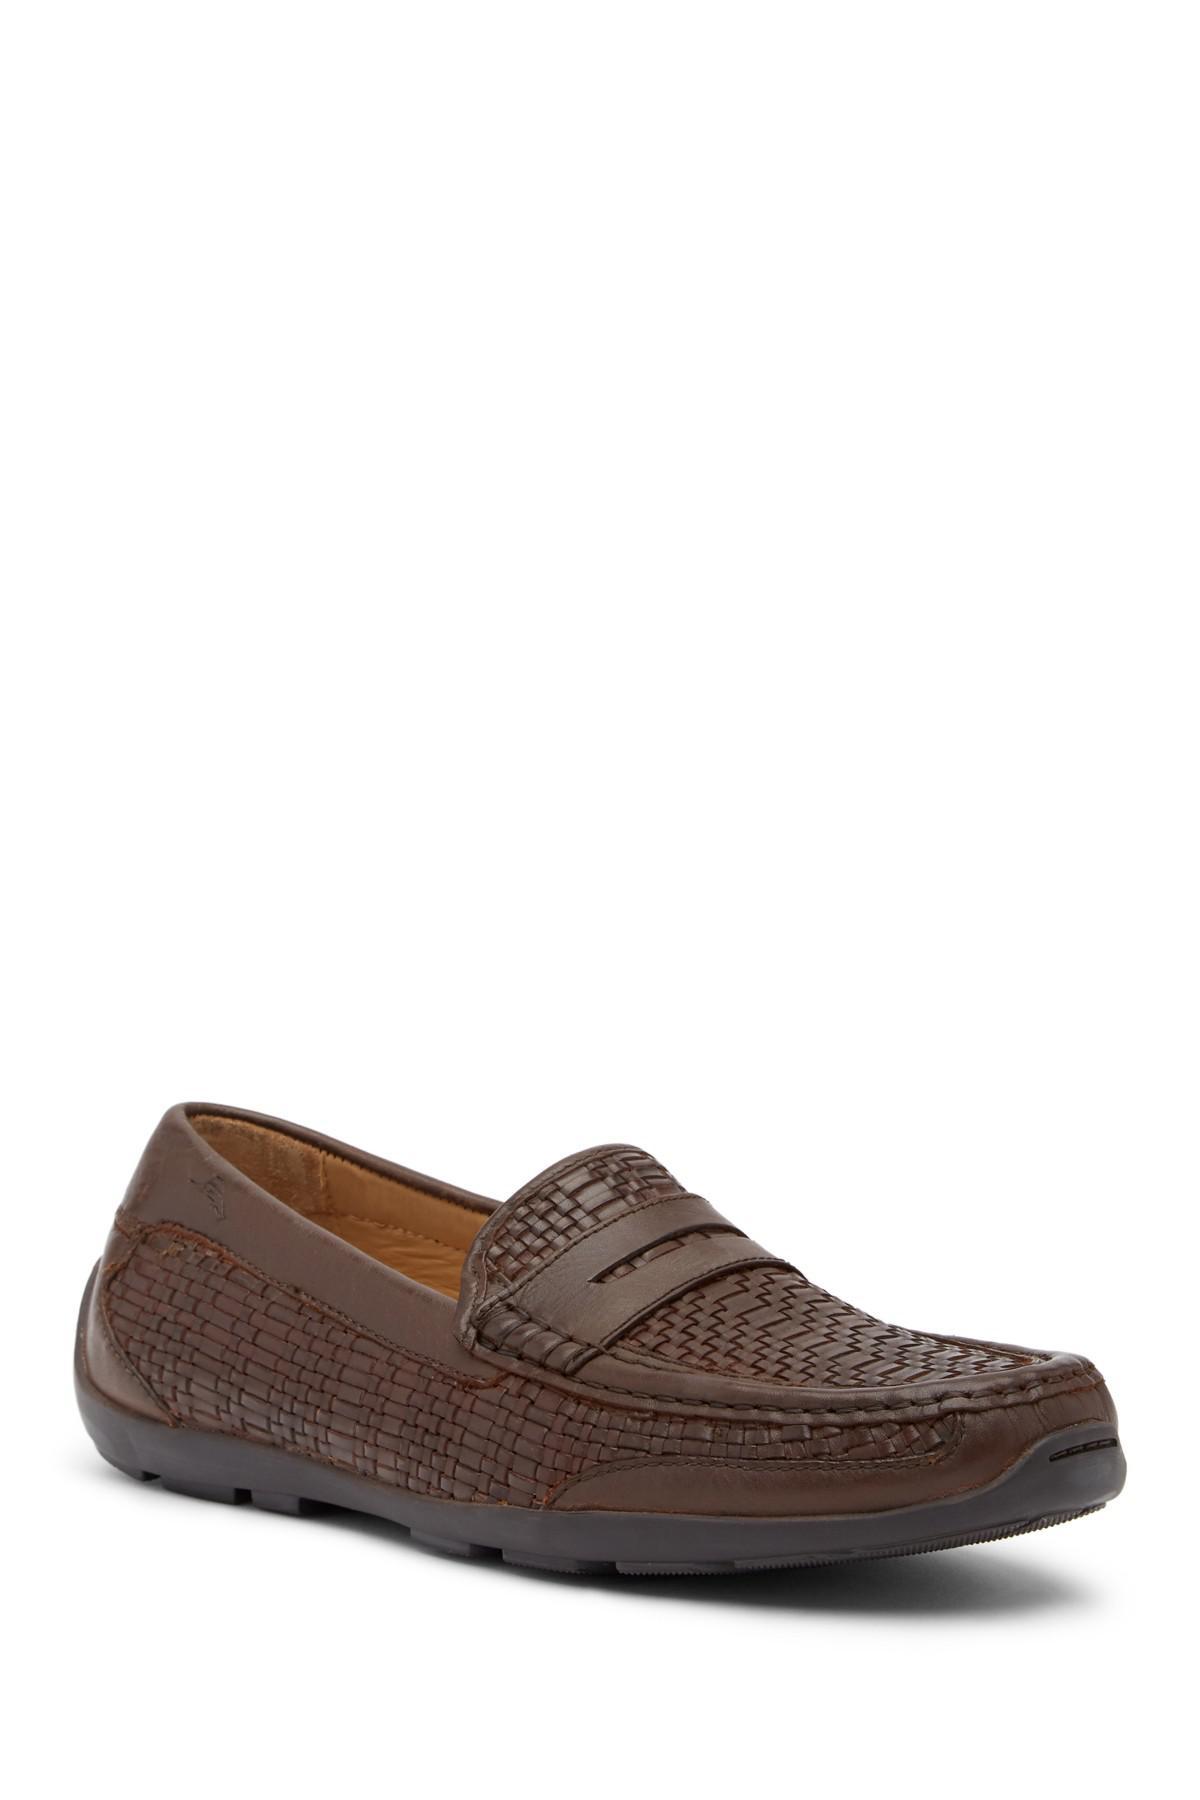 Tommy Bahama Taza Fronds Woven Leather Loafer 4VrLBRg4E